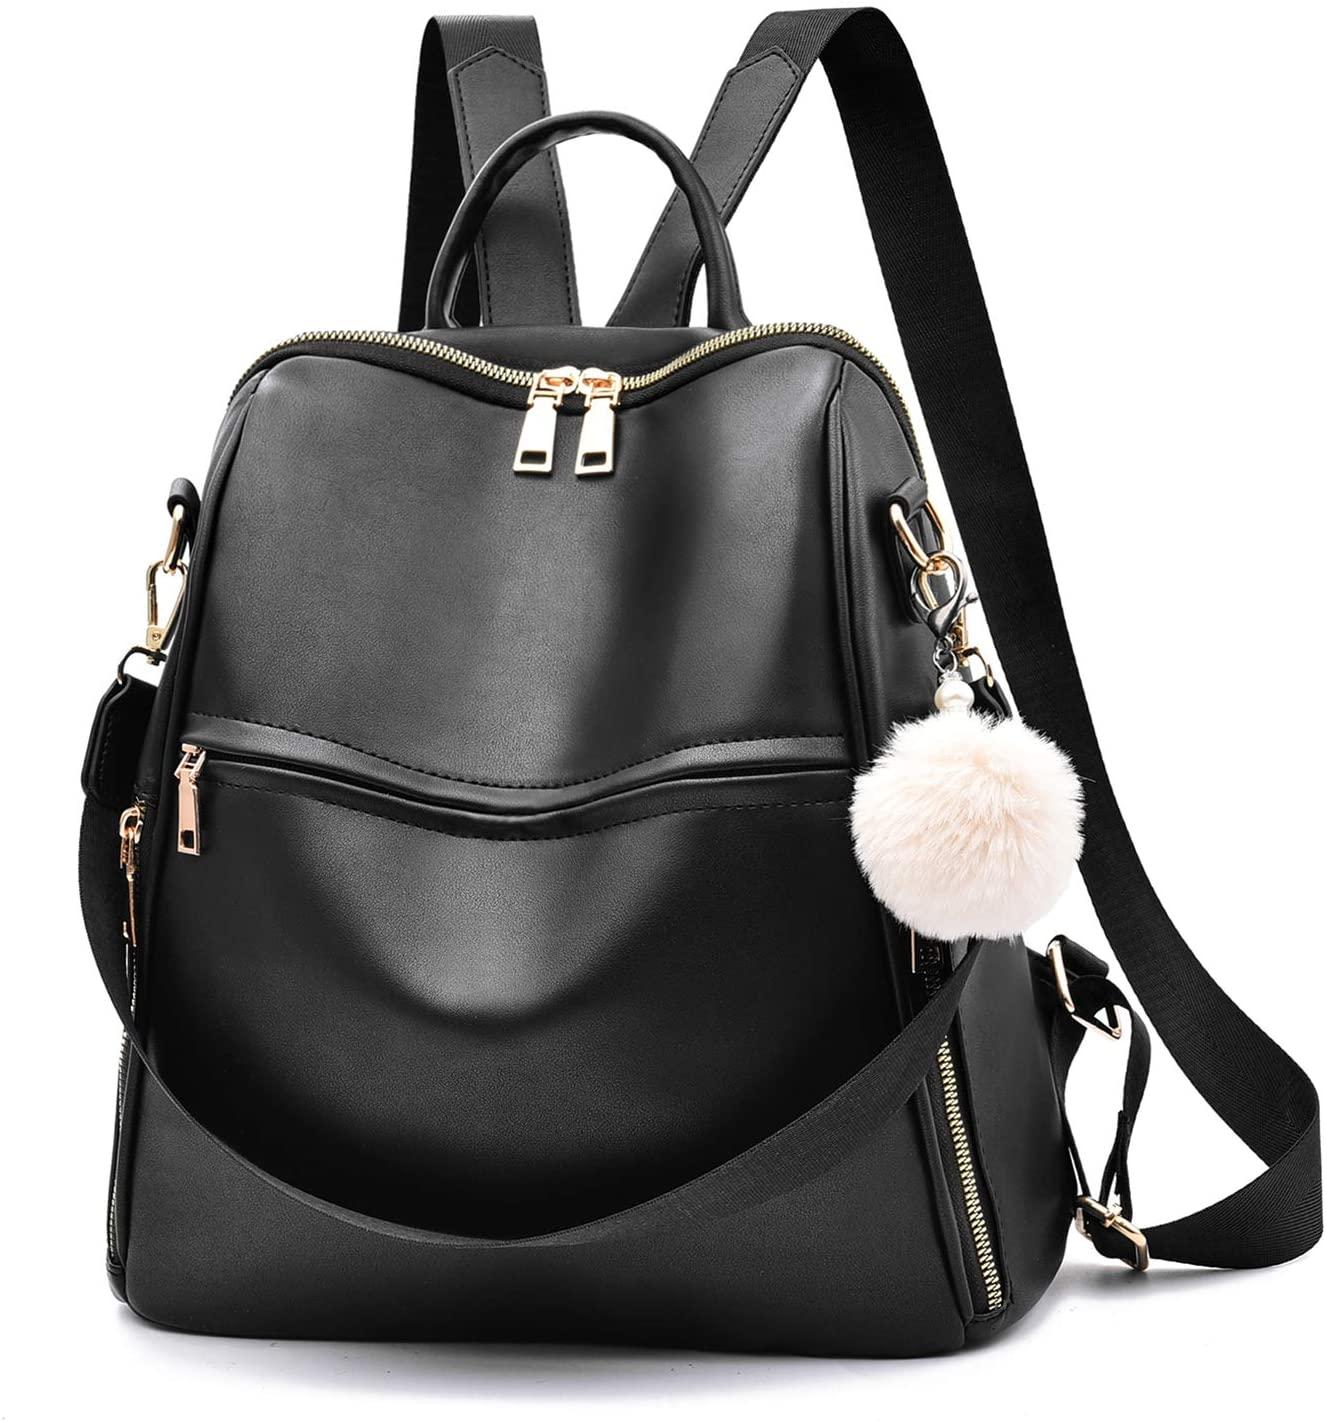 Women Backpack Purse Multifunctional Fashion Shoulder Bag Cute Backpack for Girls,Black